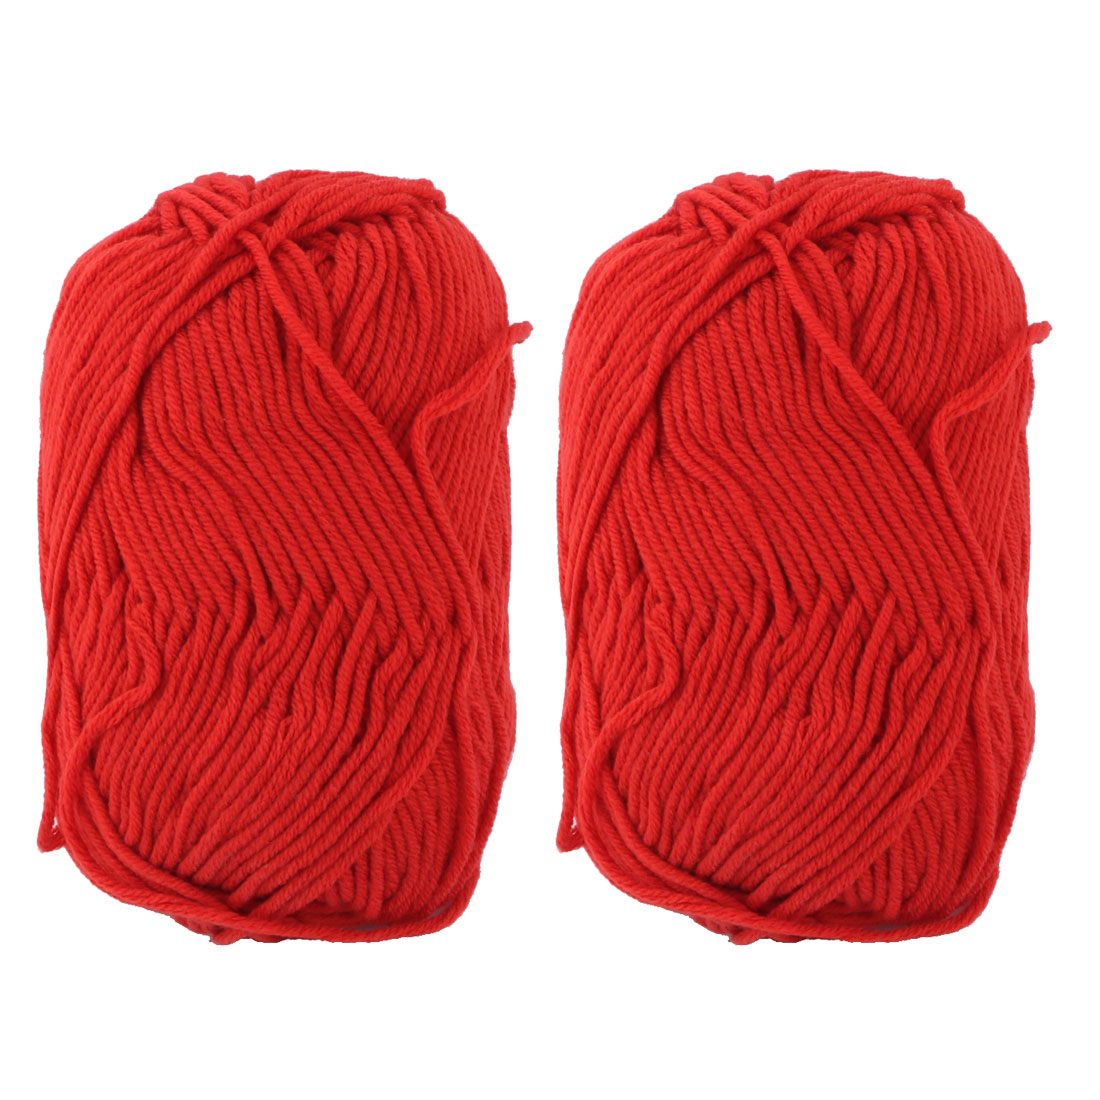 Gants-pull-Crochet-Artisanat-tissage-Fil-a-tricoter-2pcs-cordon-orange